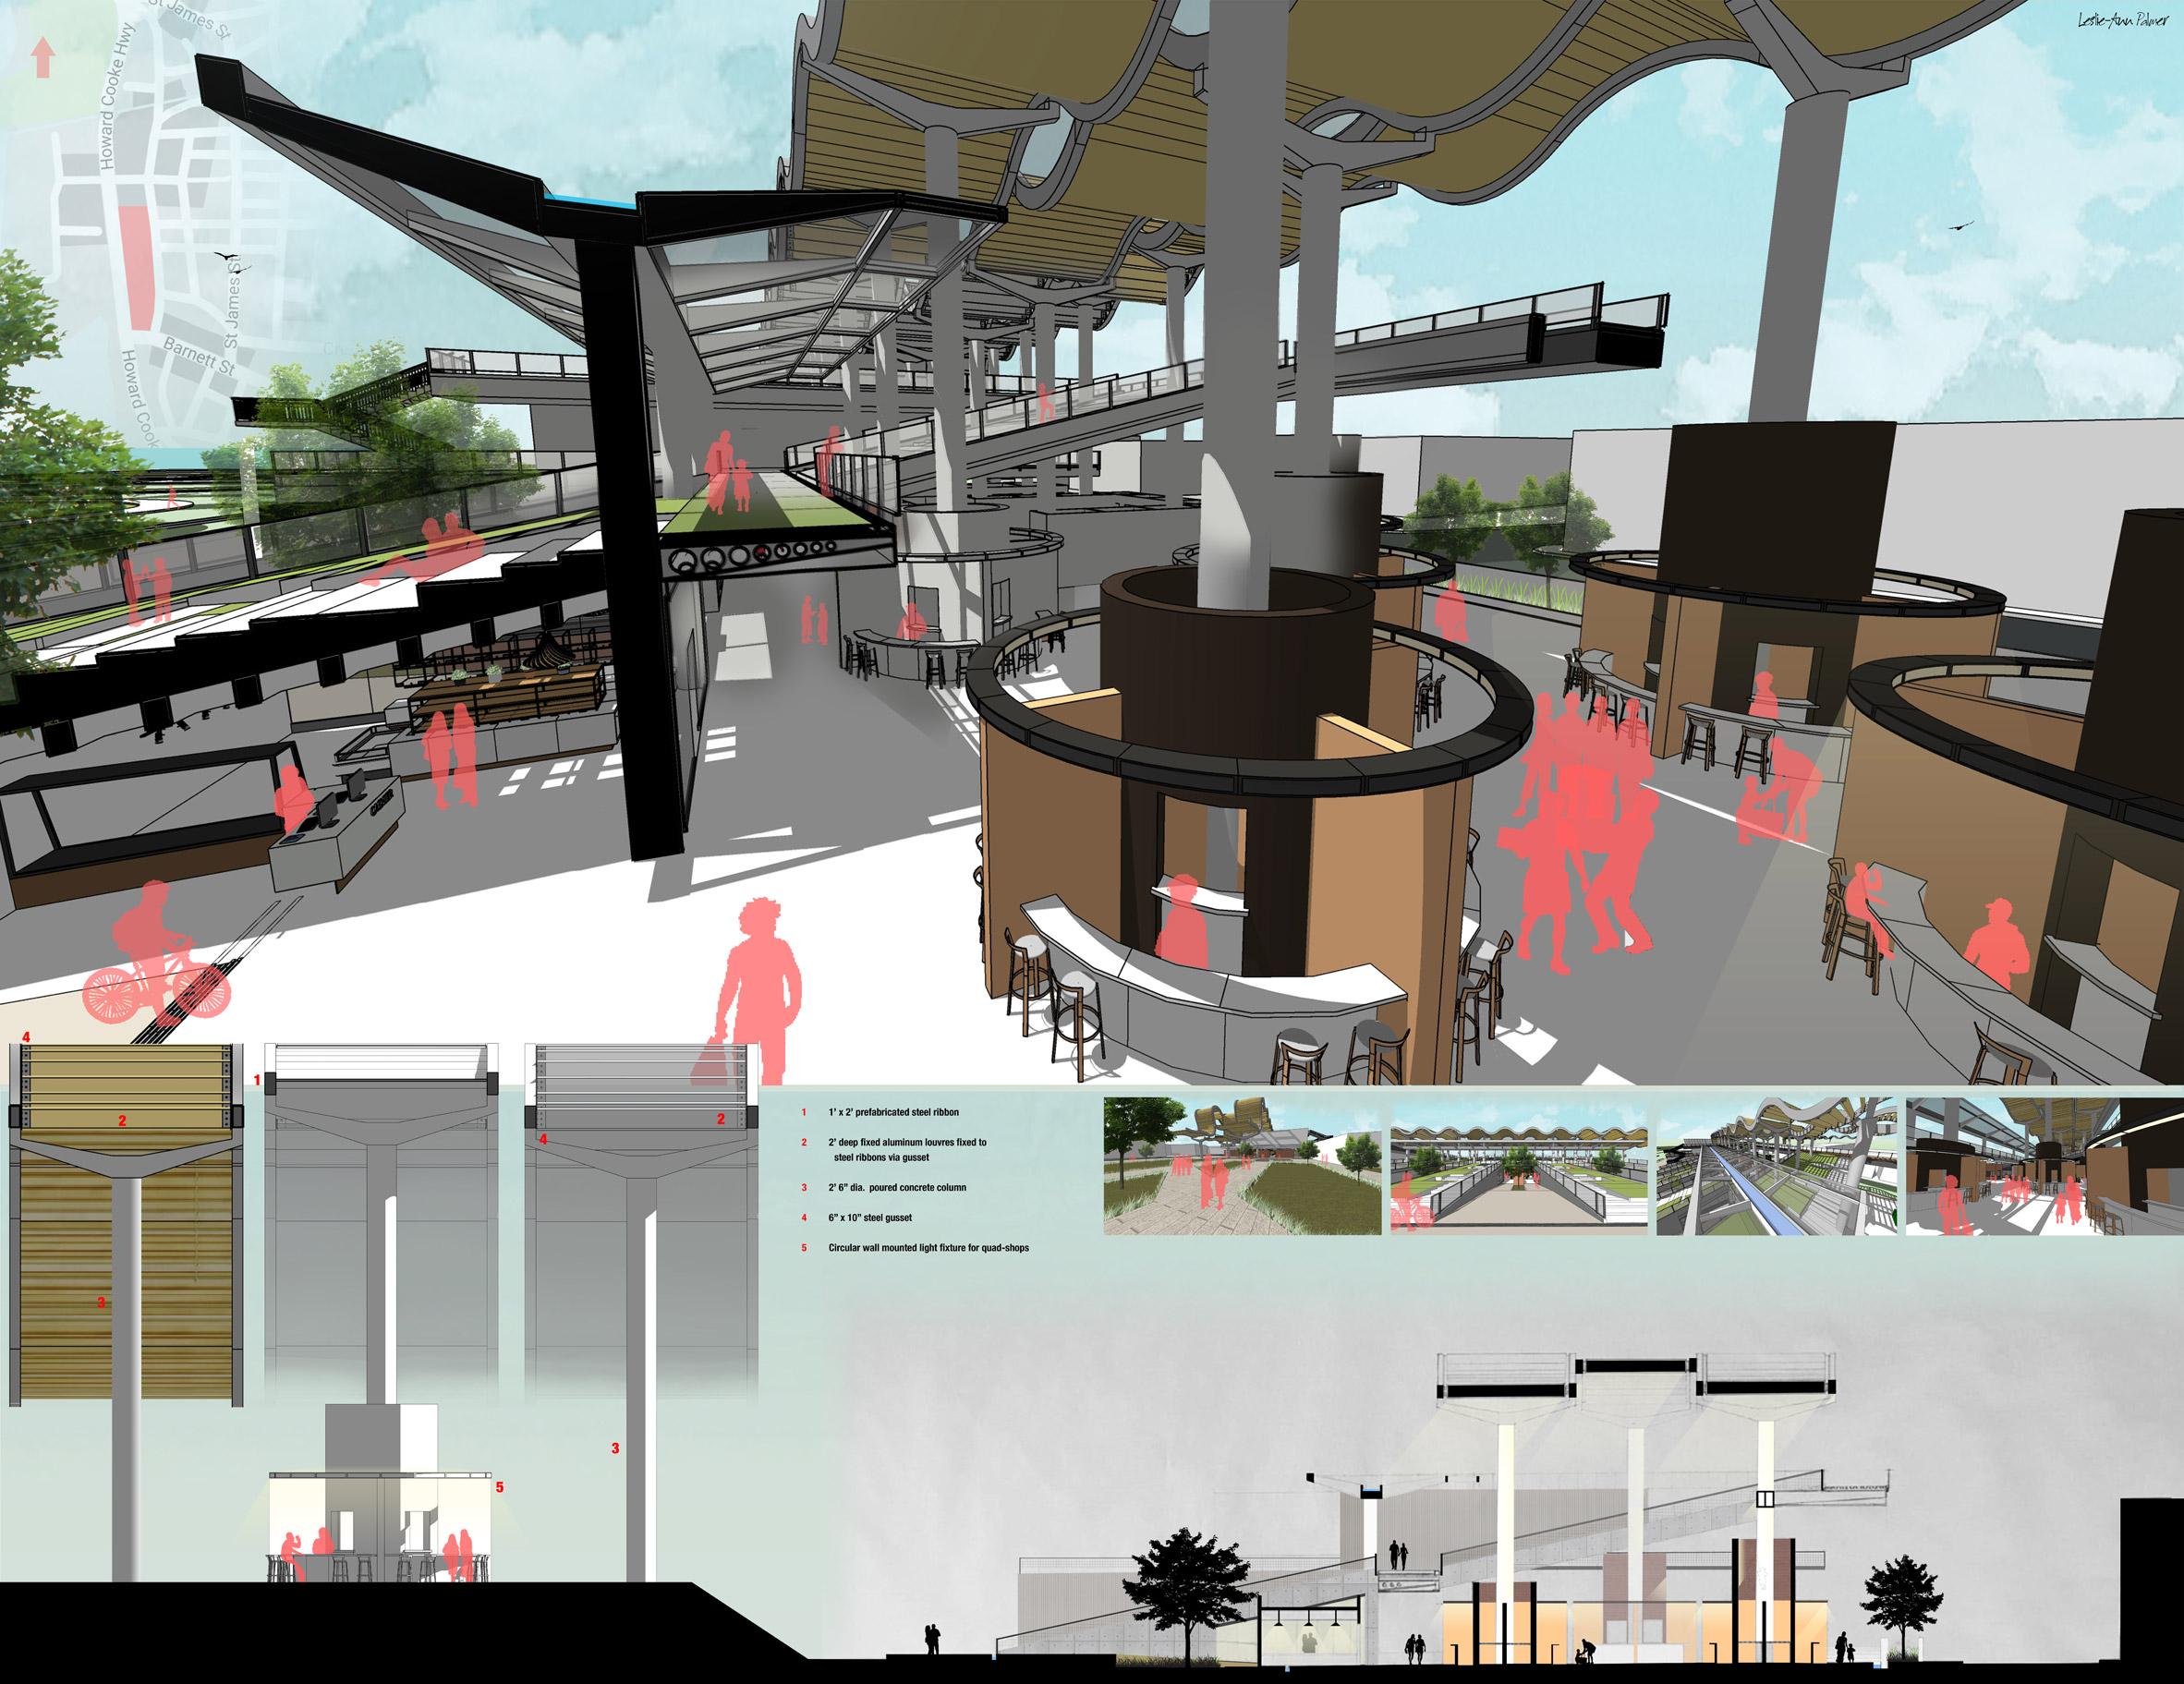 Caribbean School of Architecture students reimagine city for public good